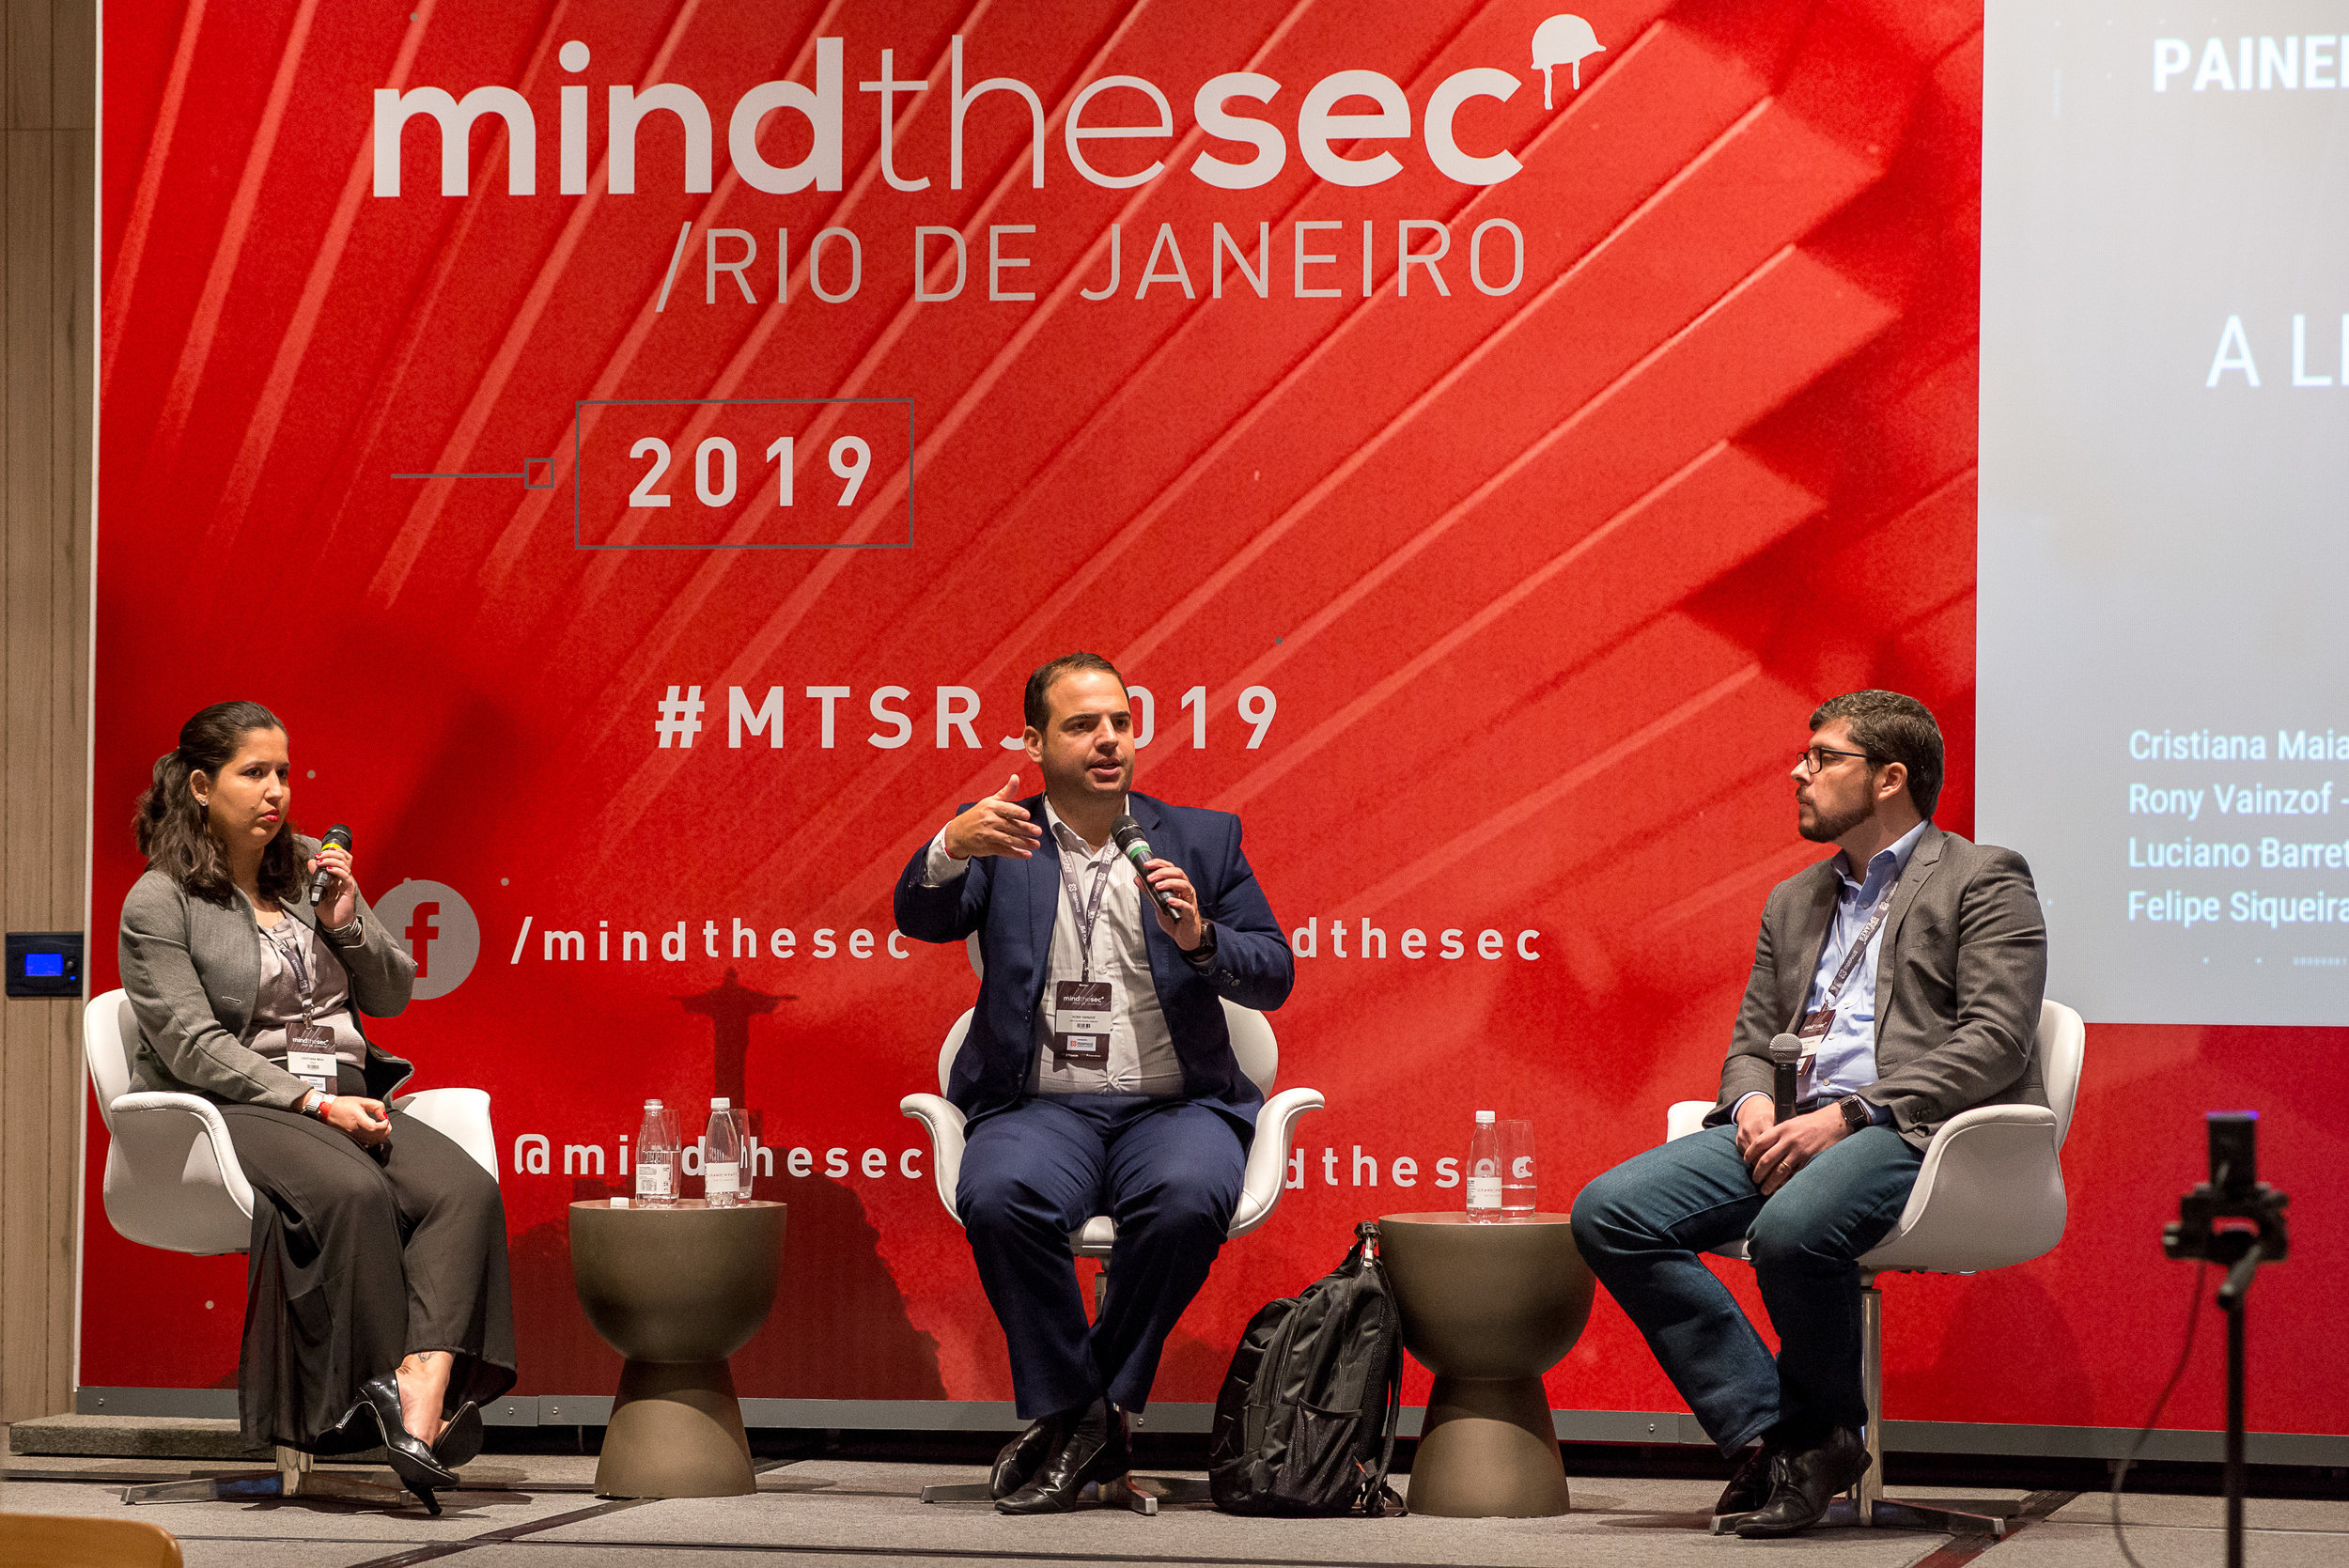 Mindthesec Rio 310.jpg